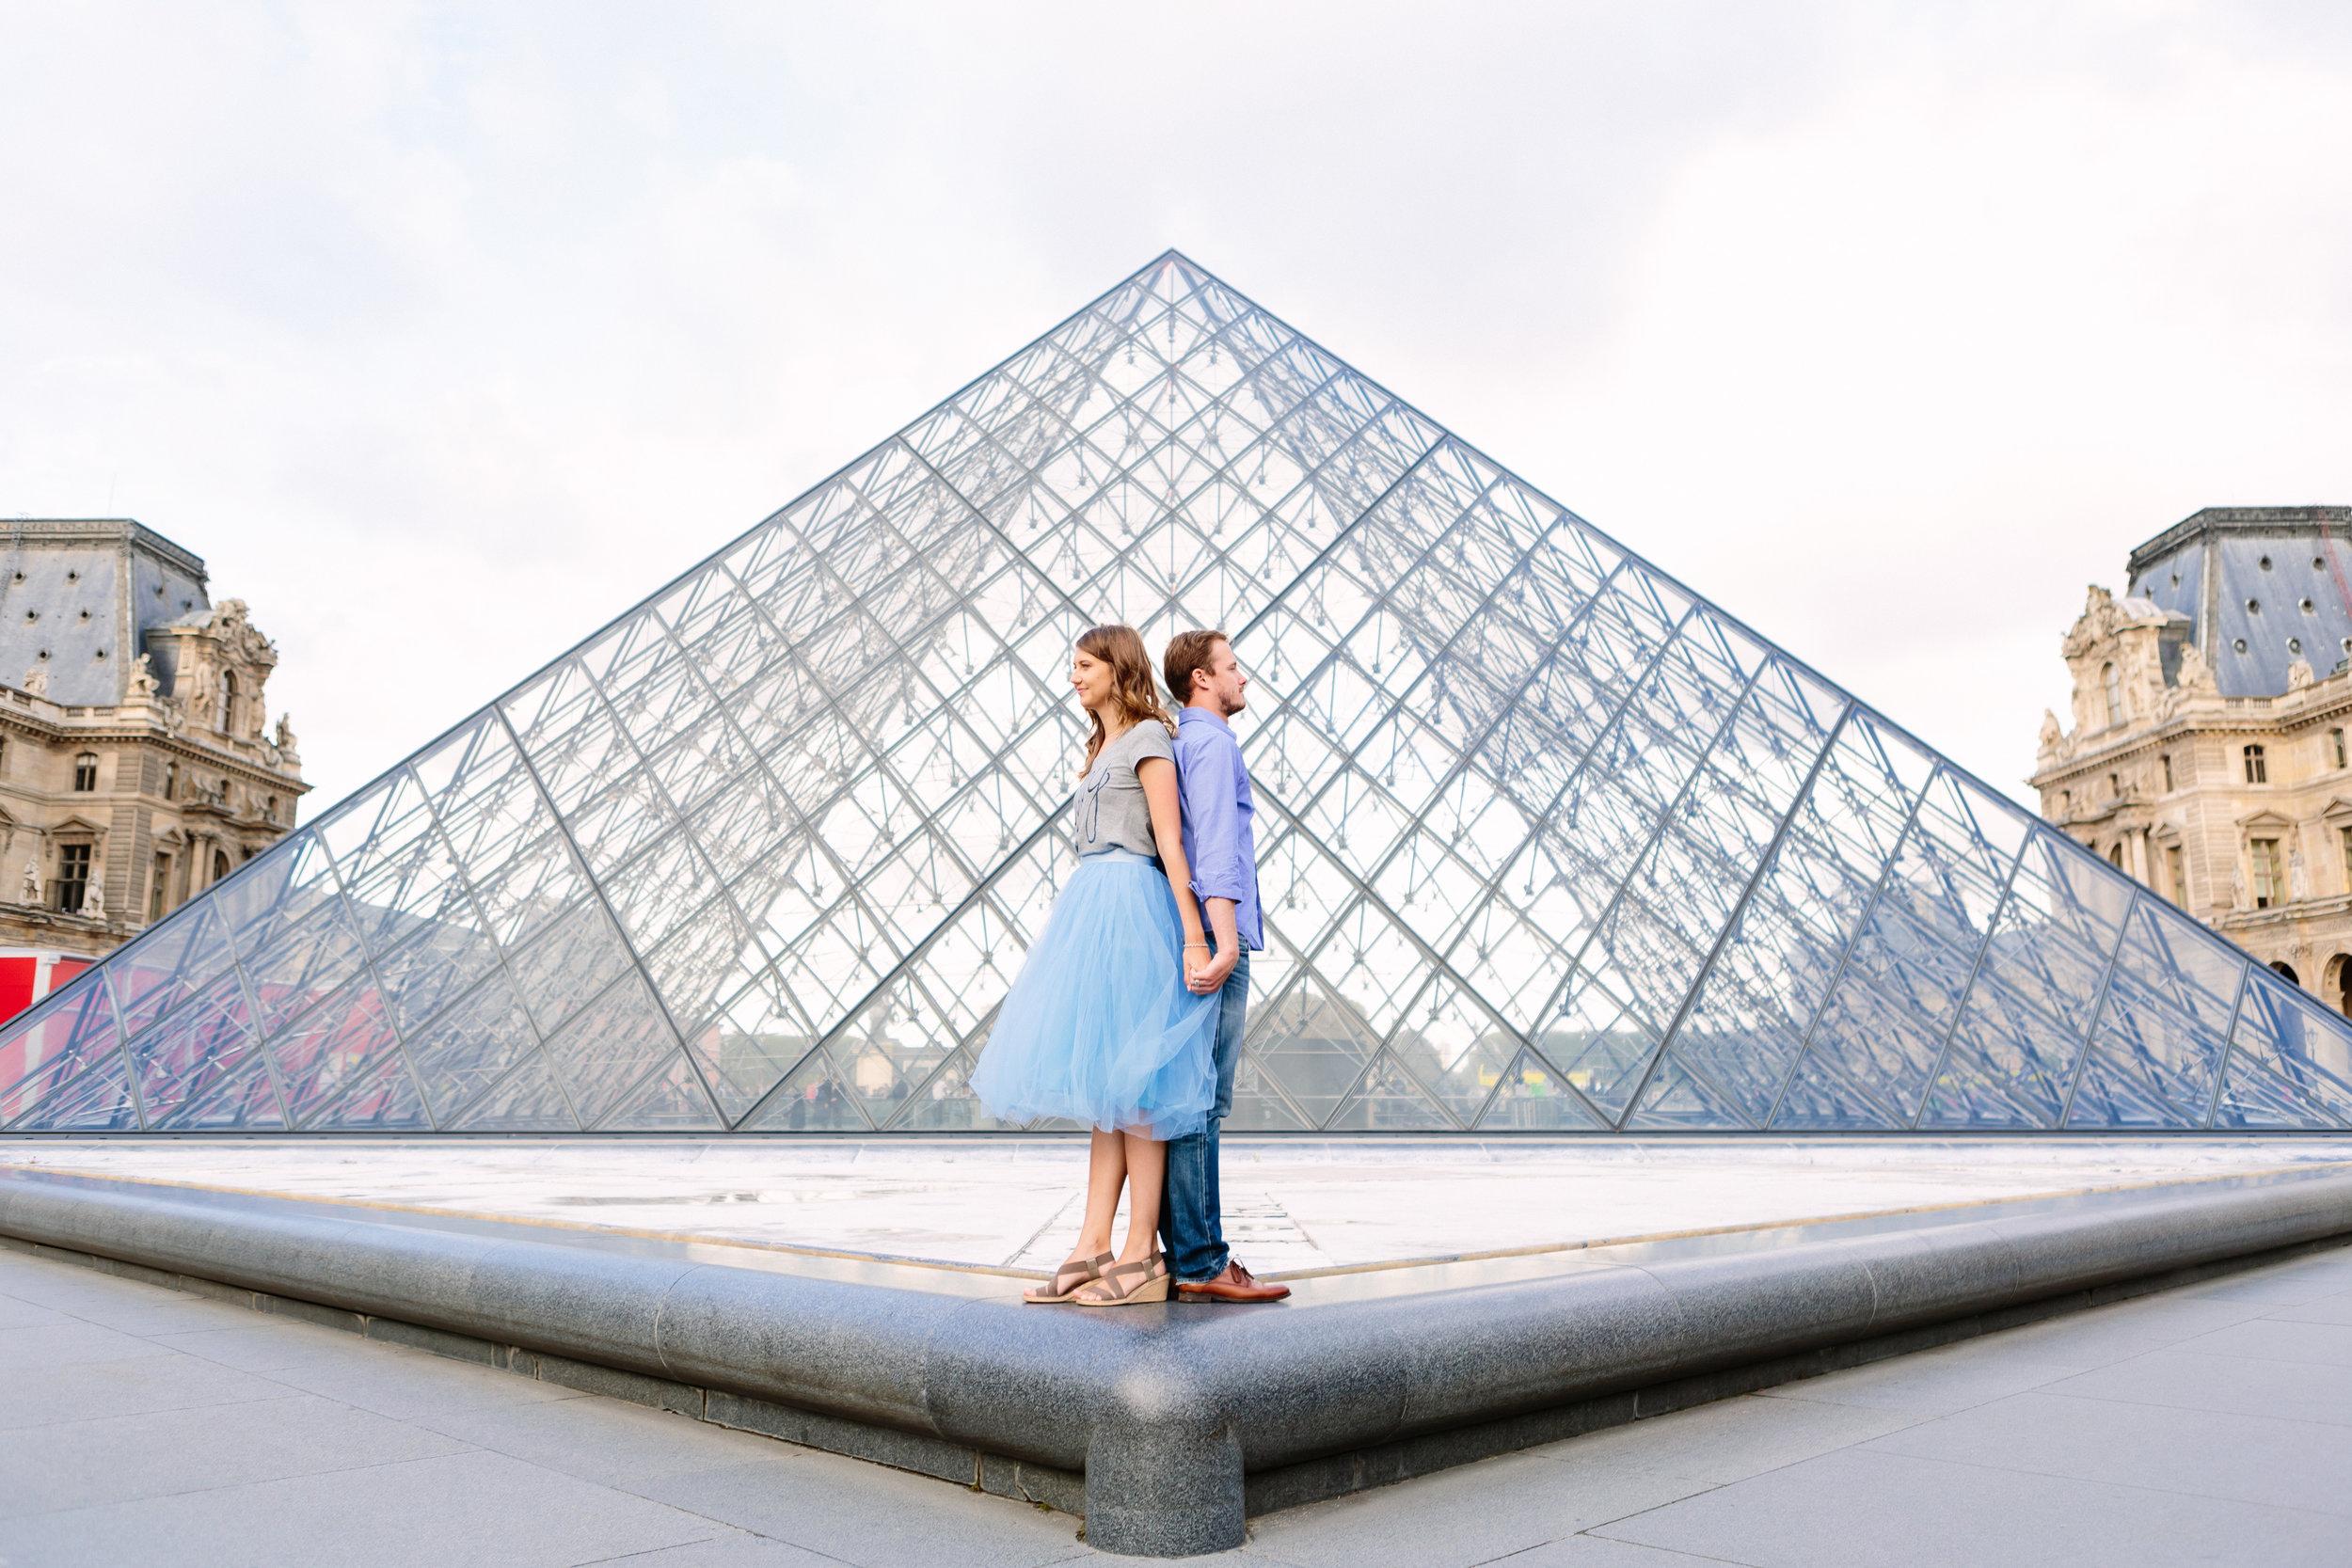 paris photographer federico guendel honeymoon couple romantic portrait session at the pyramid of louvre museum